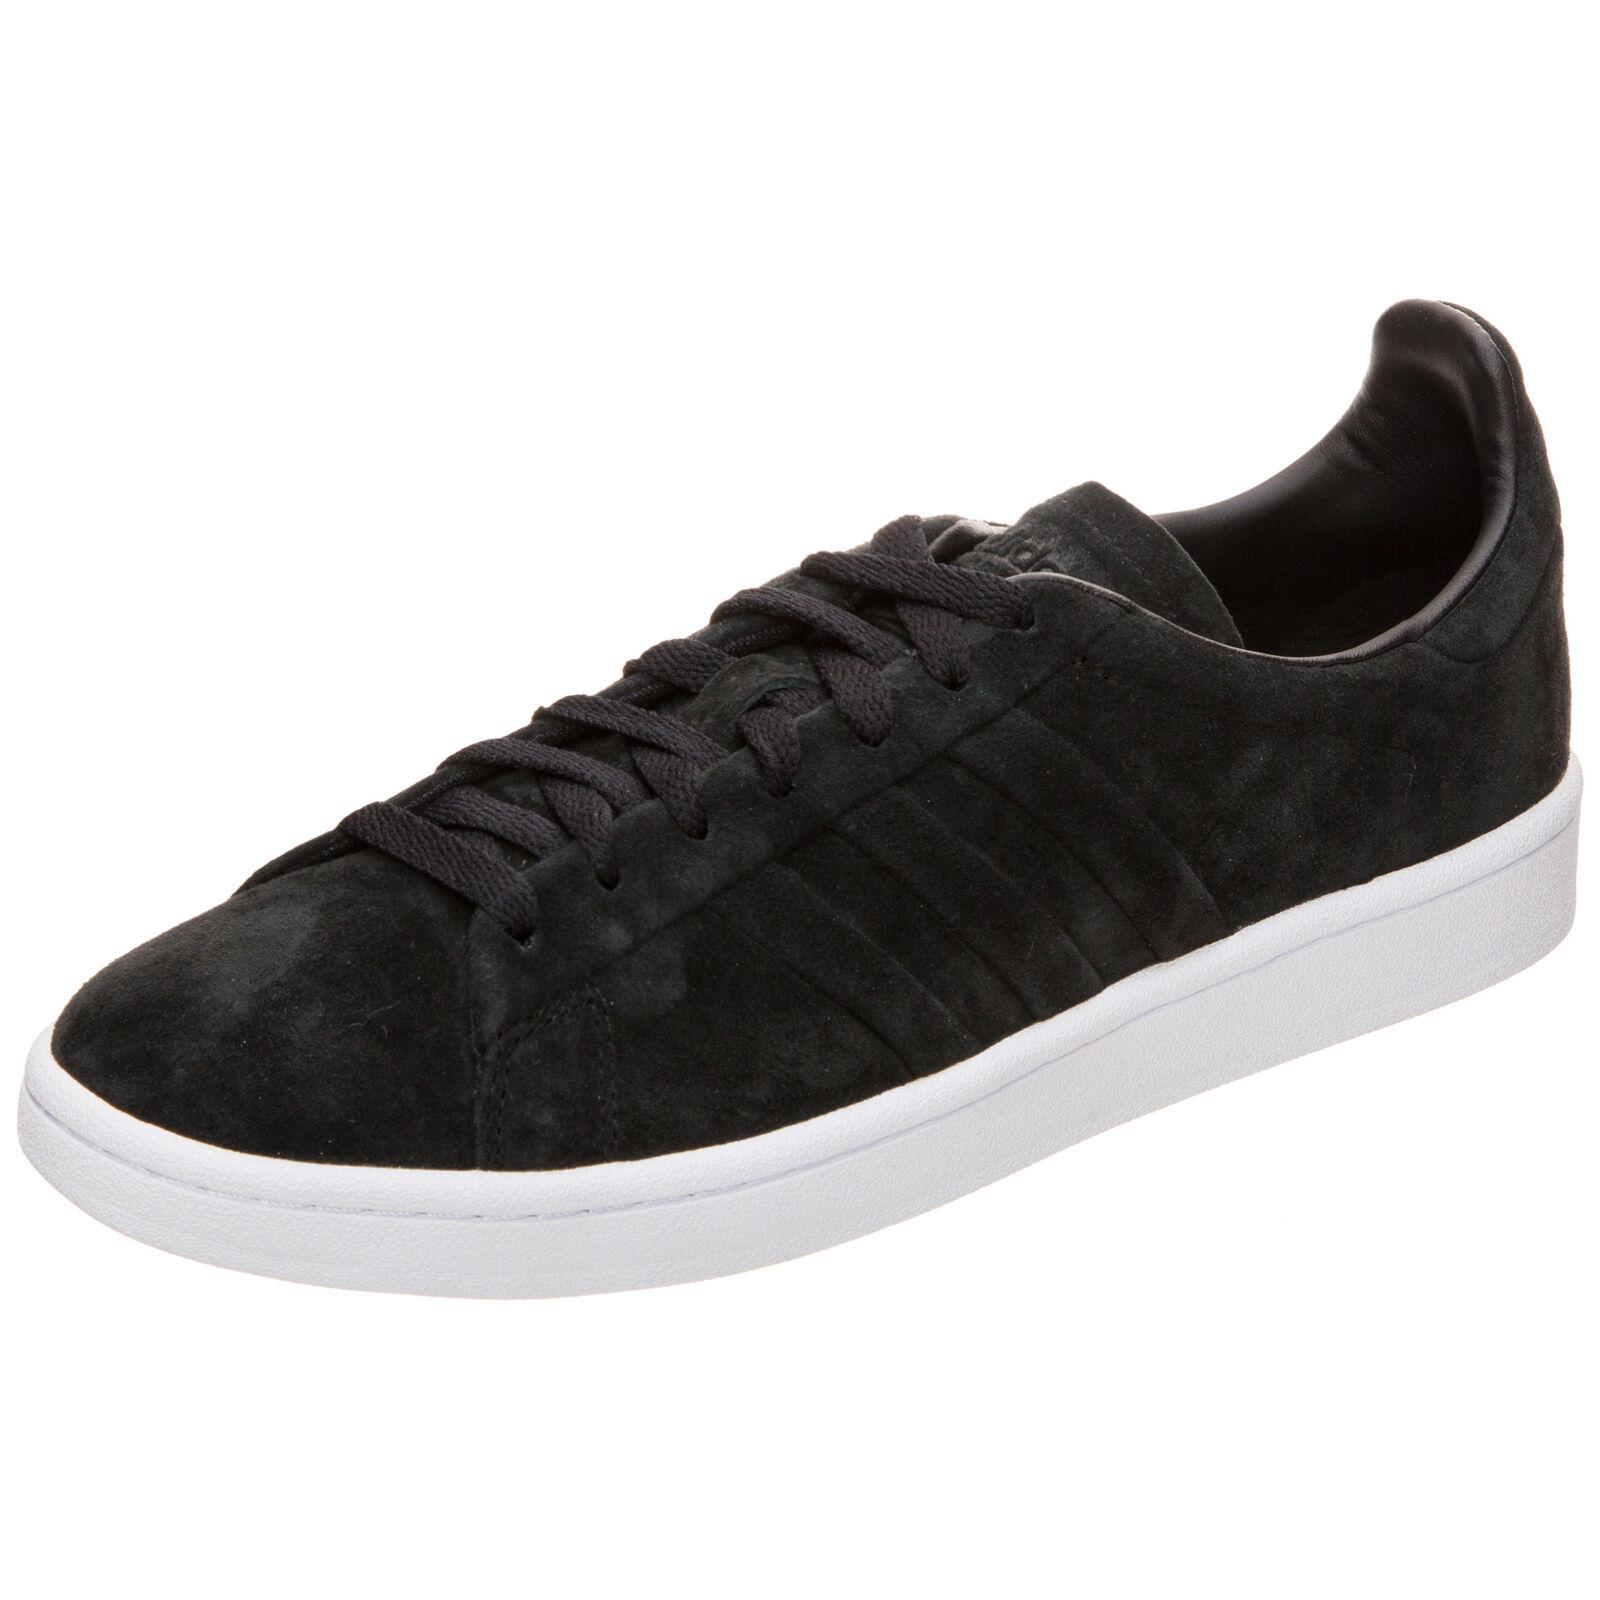 adidas Originals Campus Stitch and Turn Sneaker dunkelrot NEU Schuhe Turnschuhe